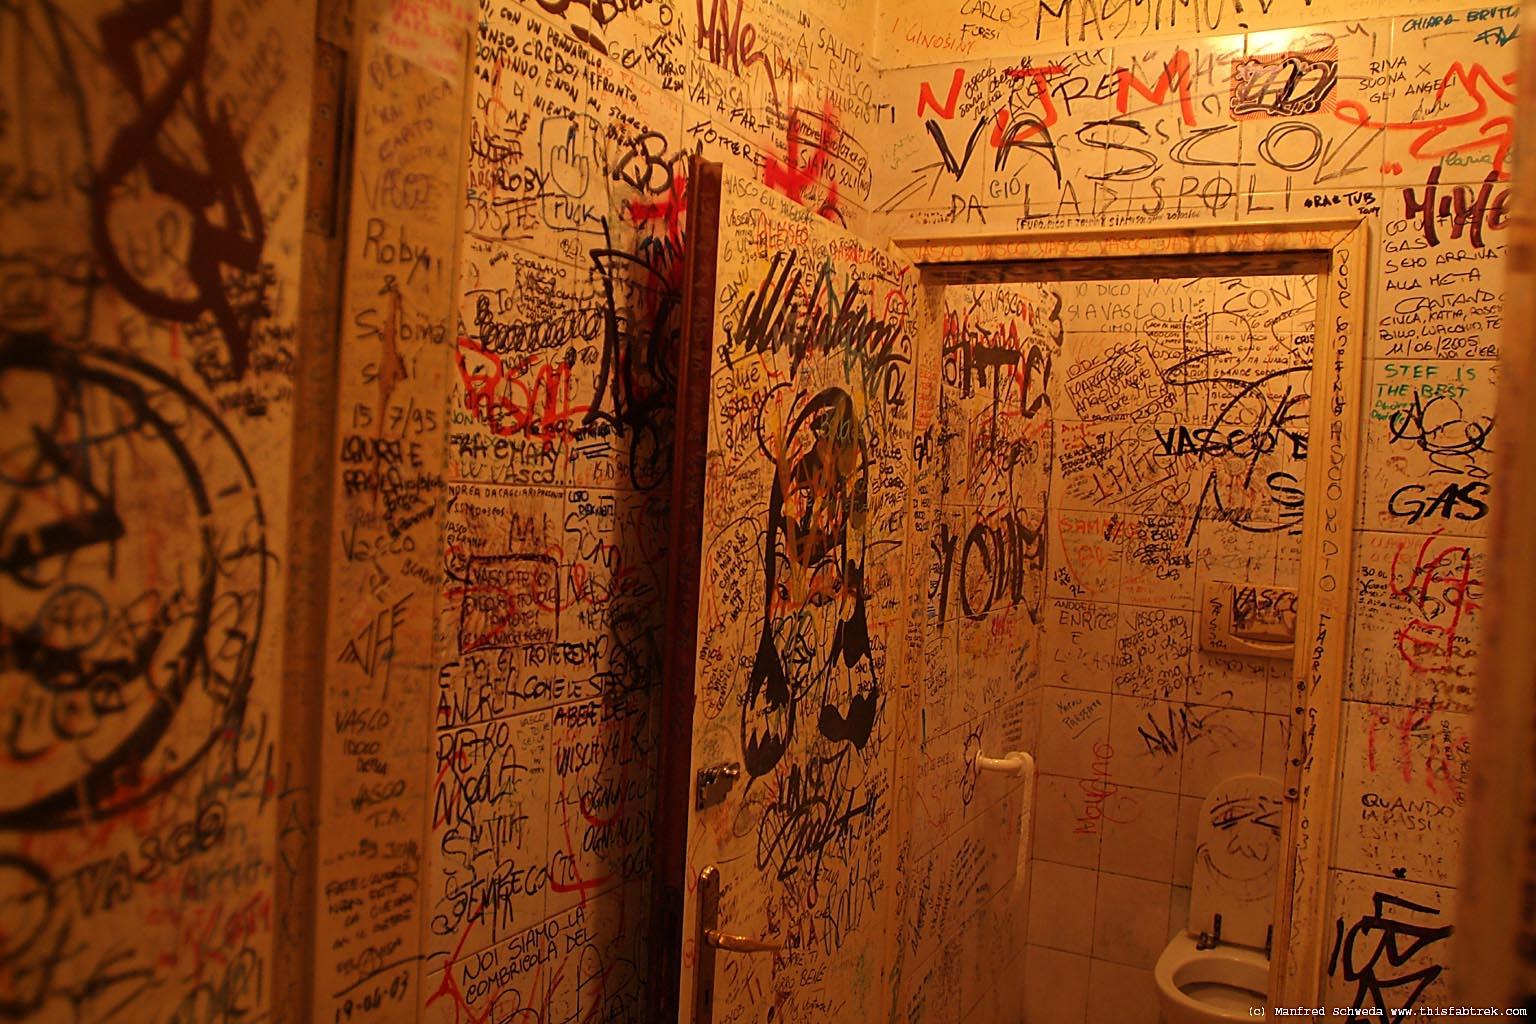 Bathroom wall writings - Bathroom Wall Writings 44